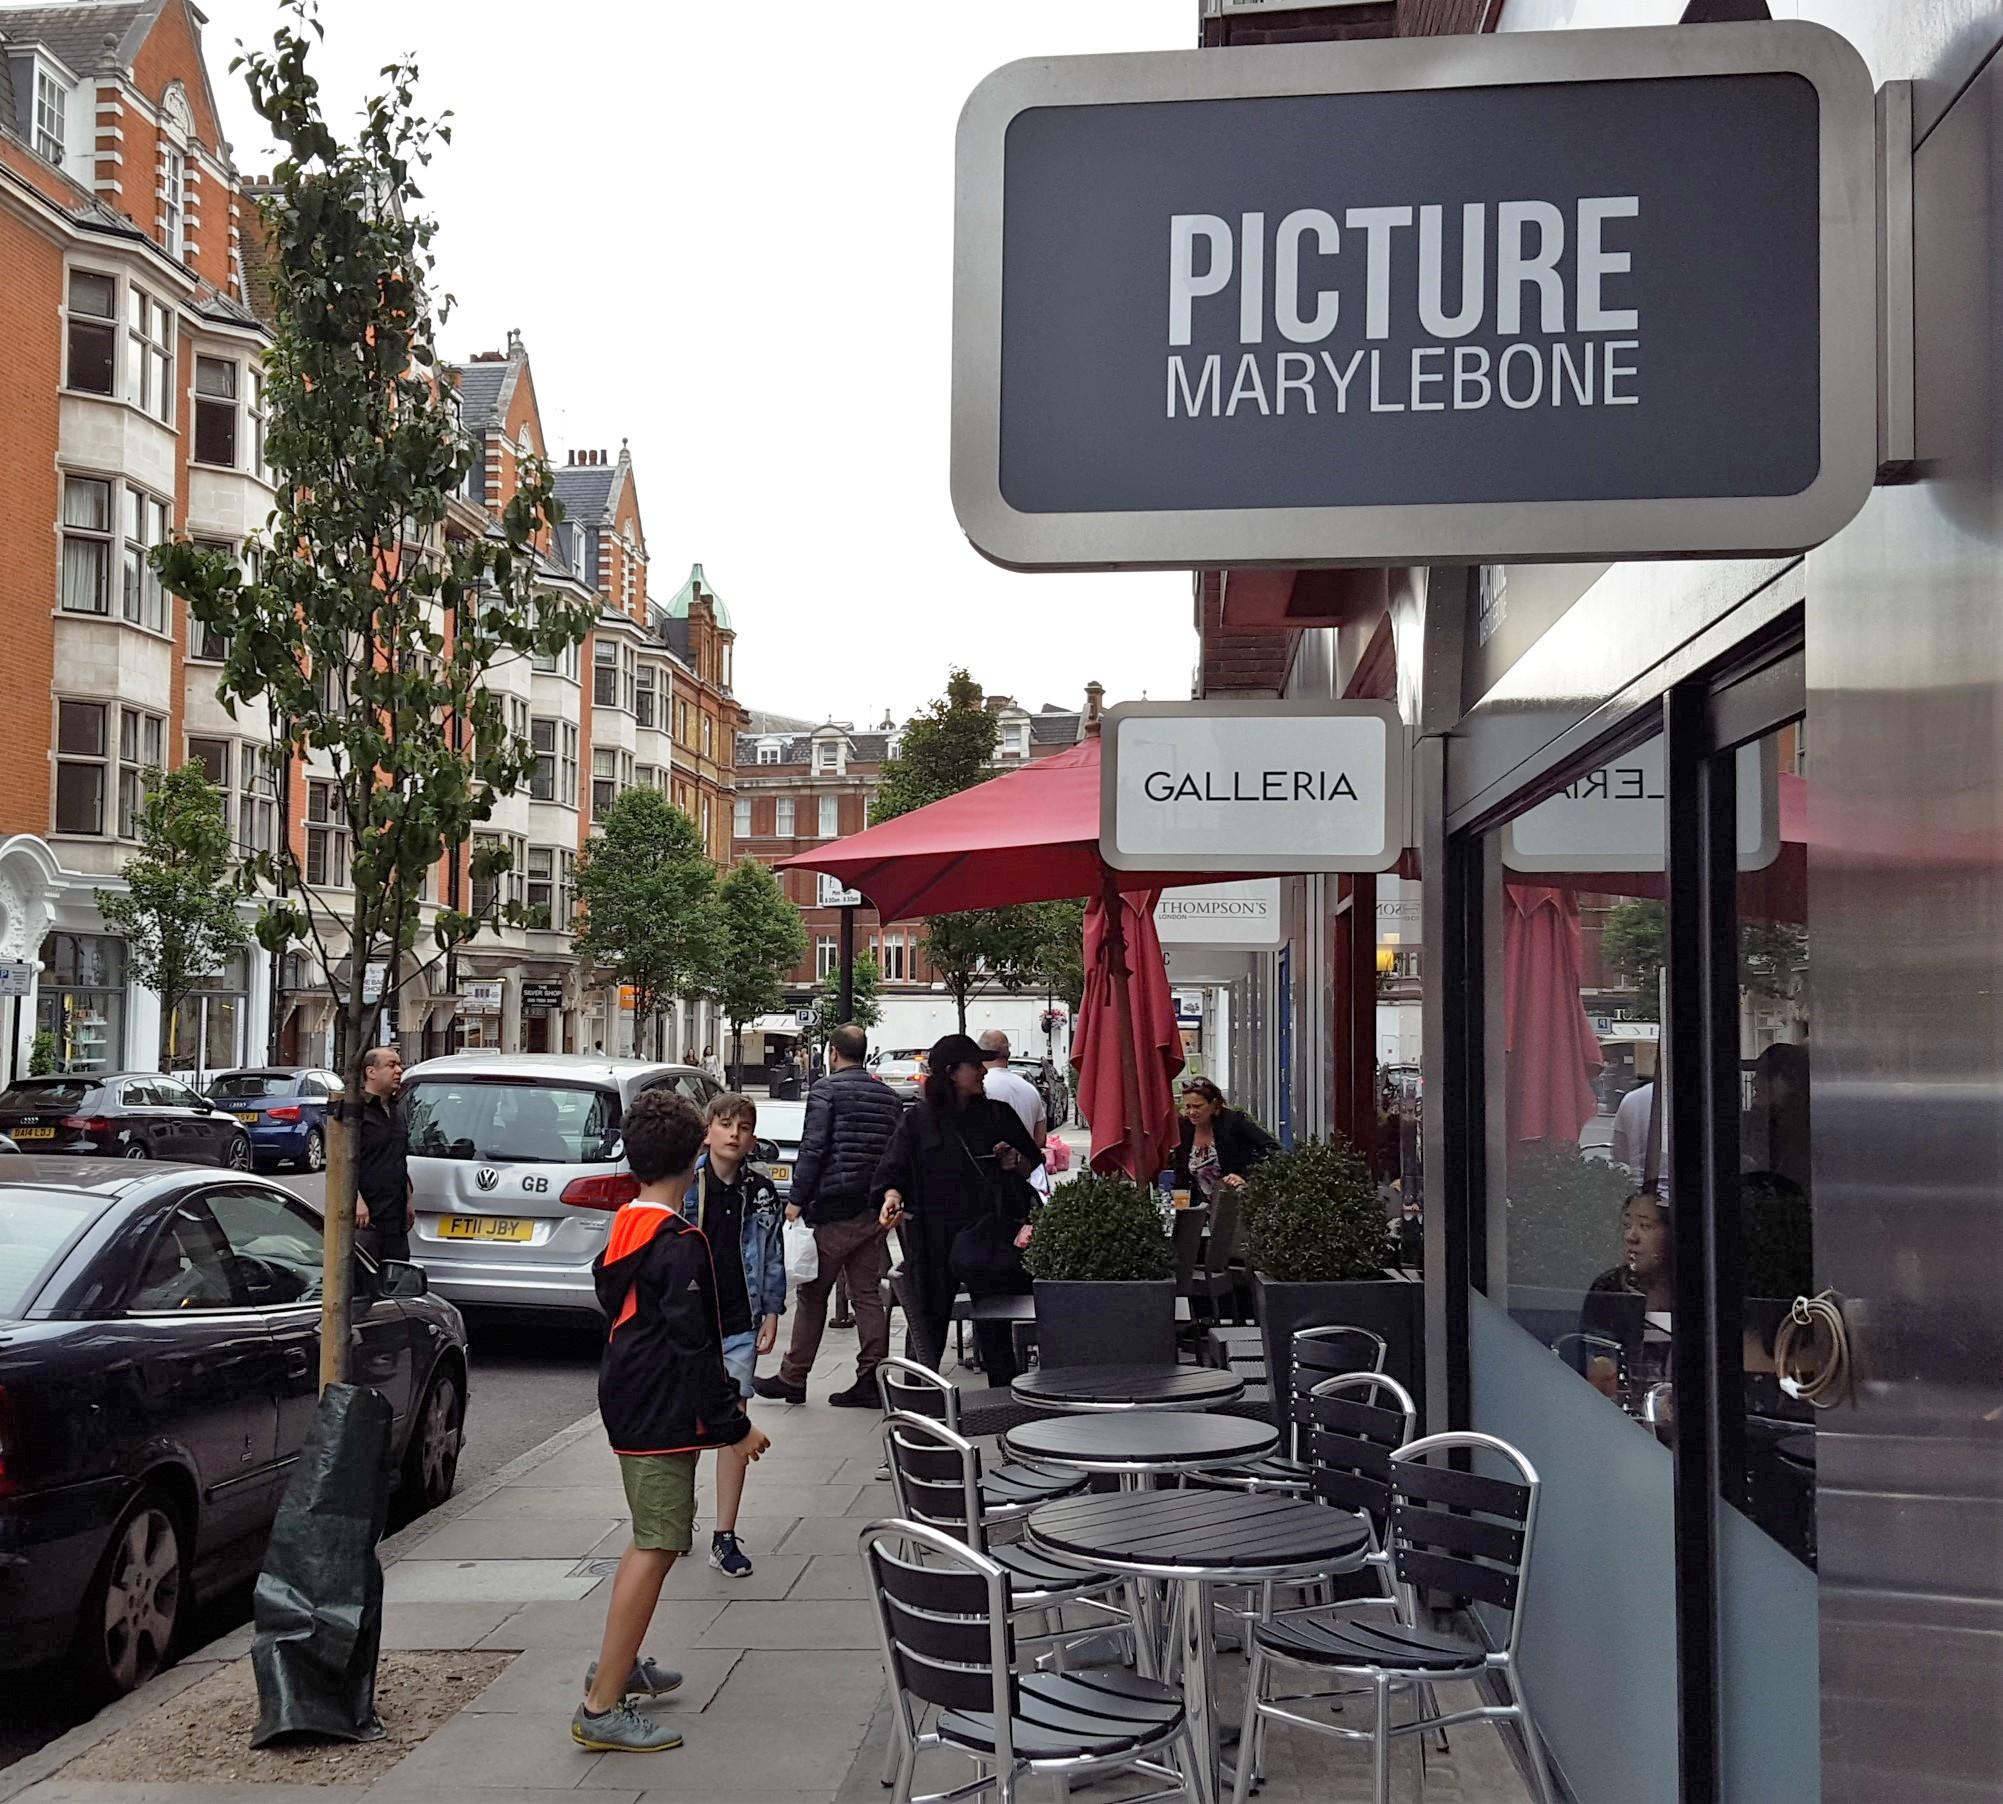 Picture Marylebone